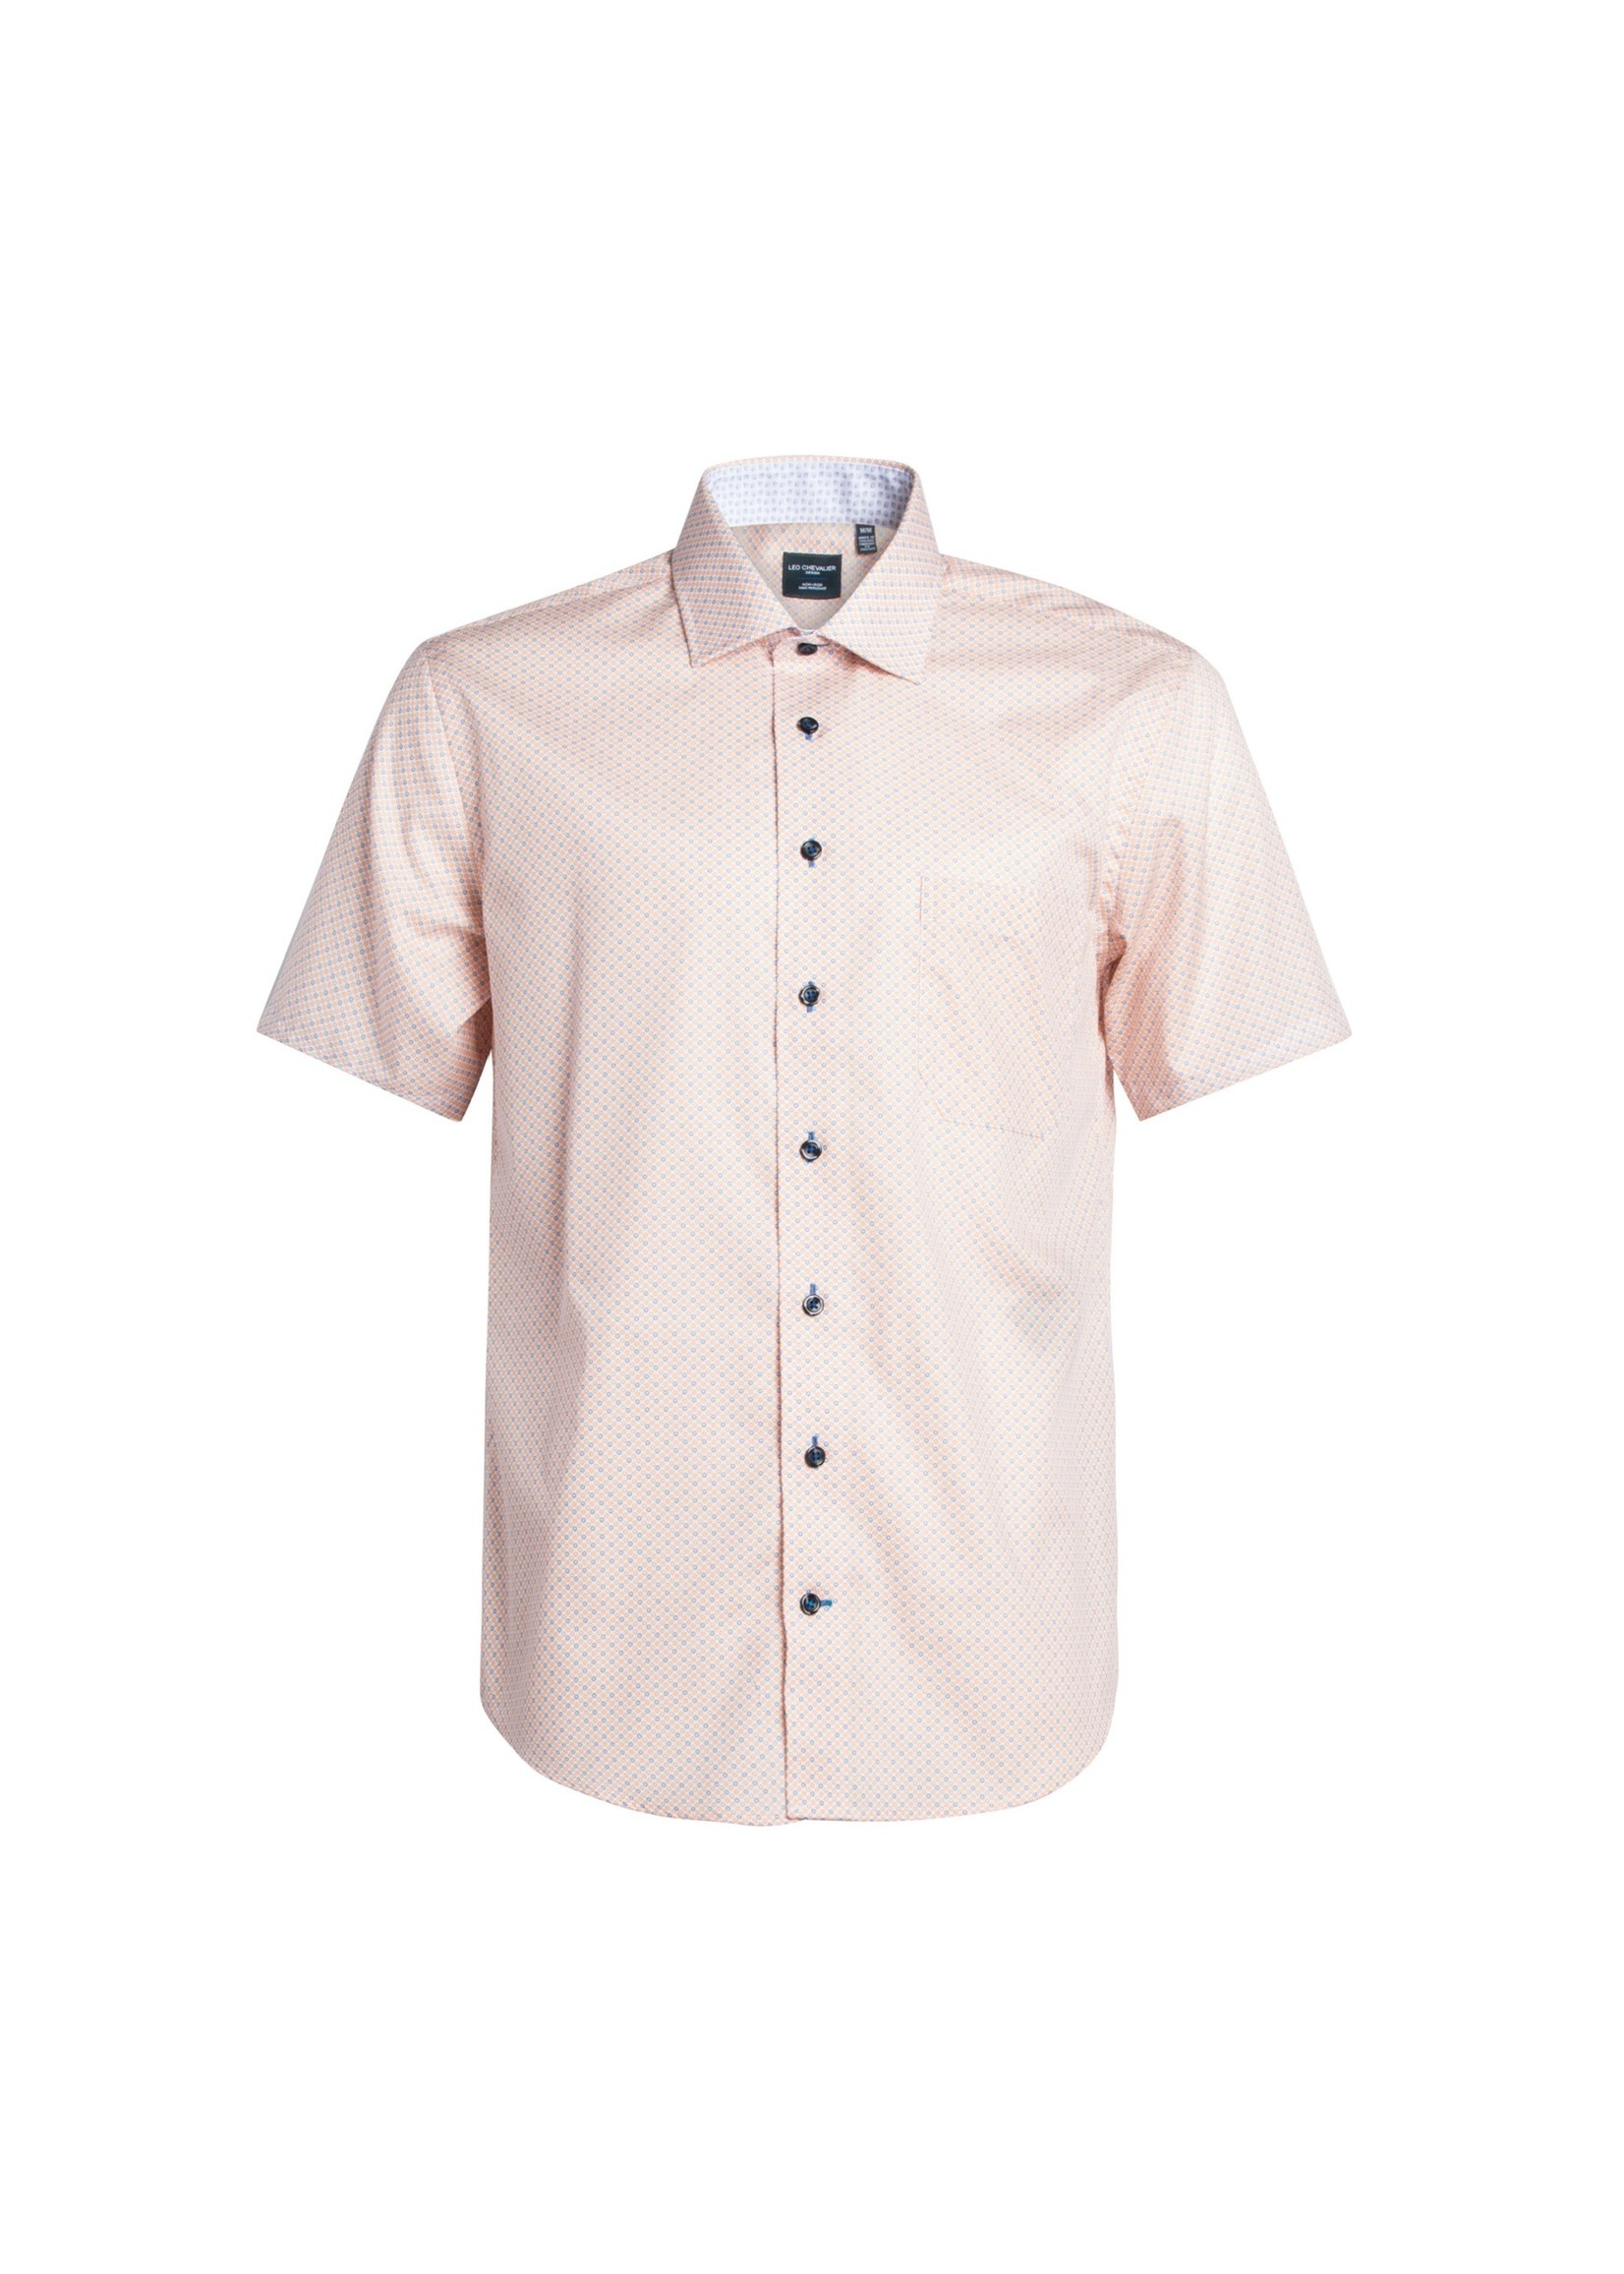 Leo Chevalier Short Sleeve Shirt